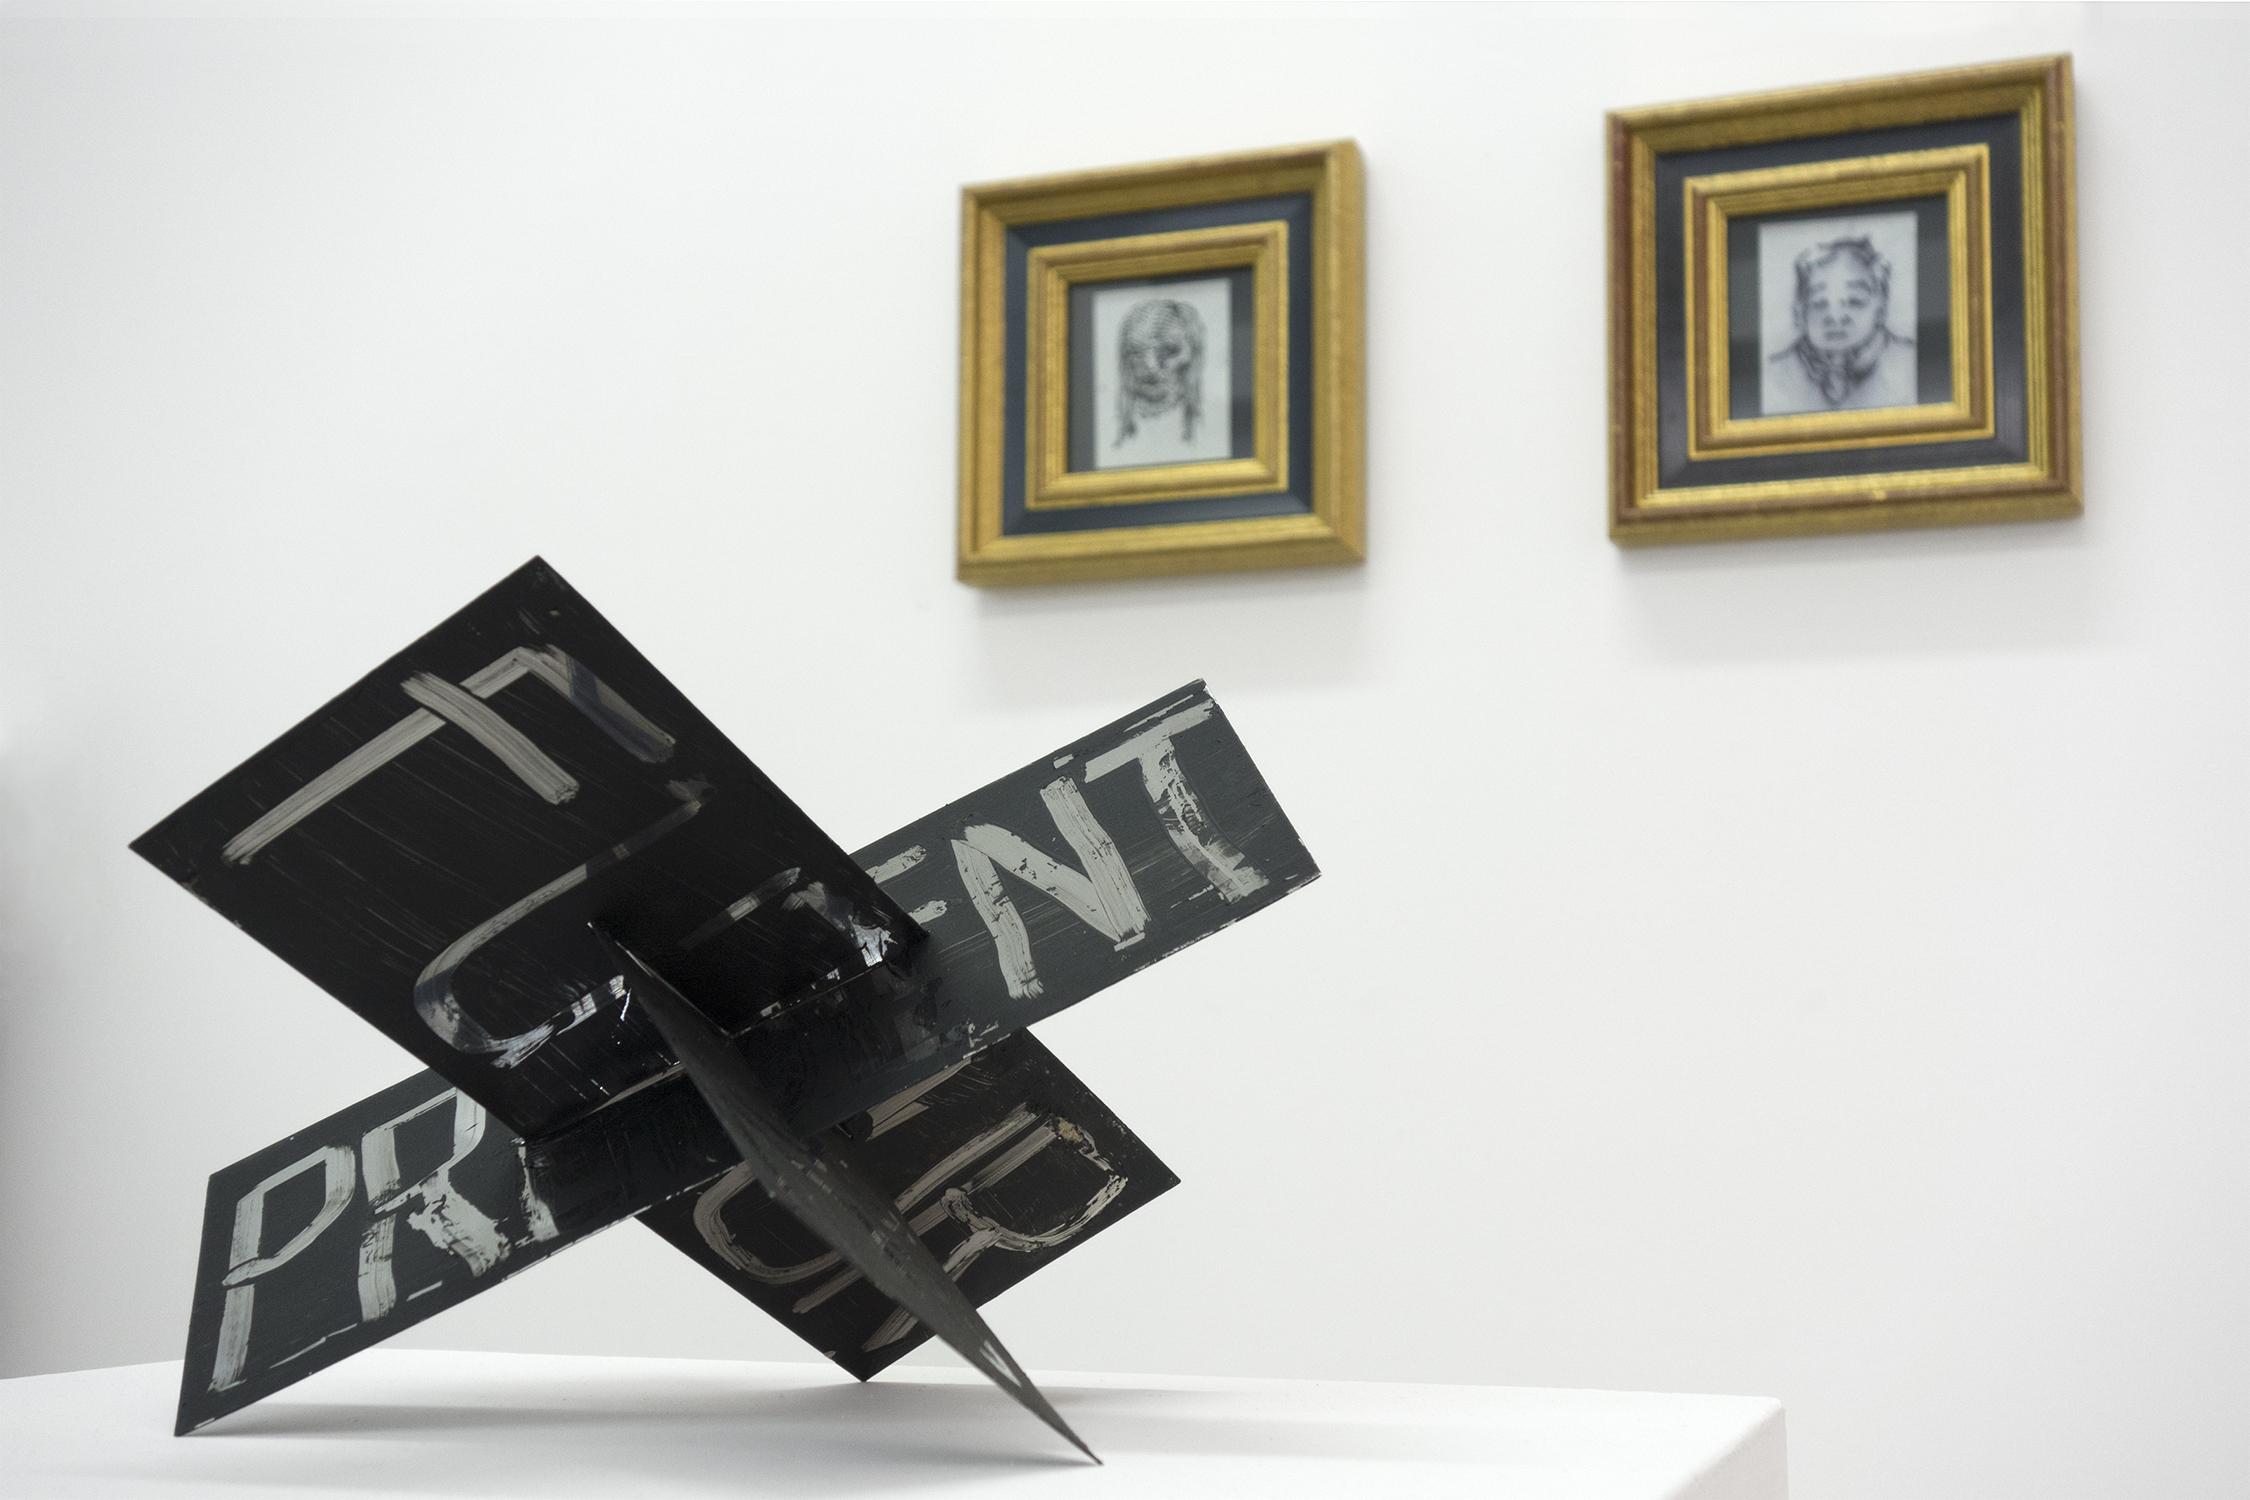 Truc-Anh_2013_Galerie-Sator_JEP_06